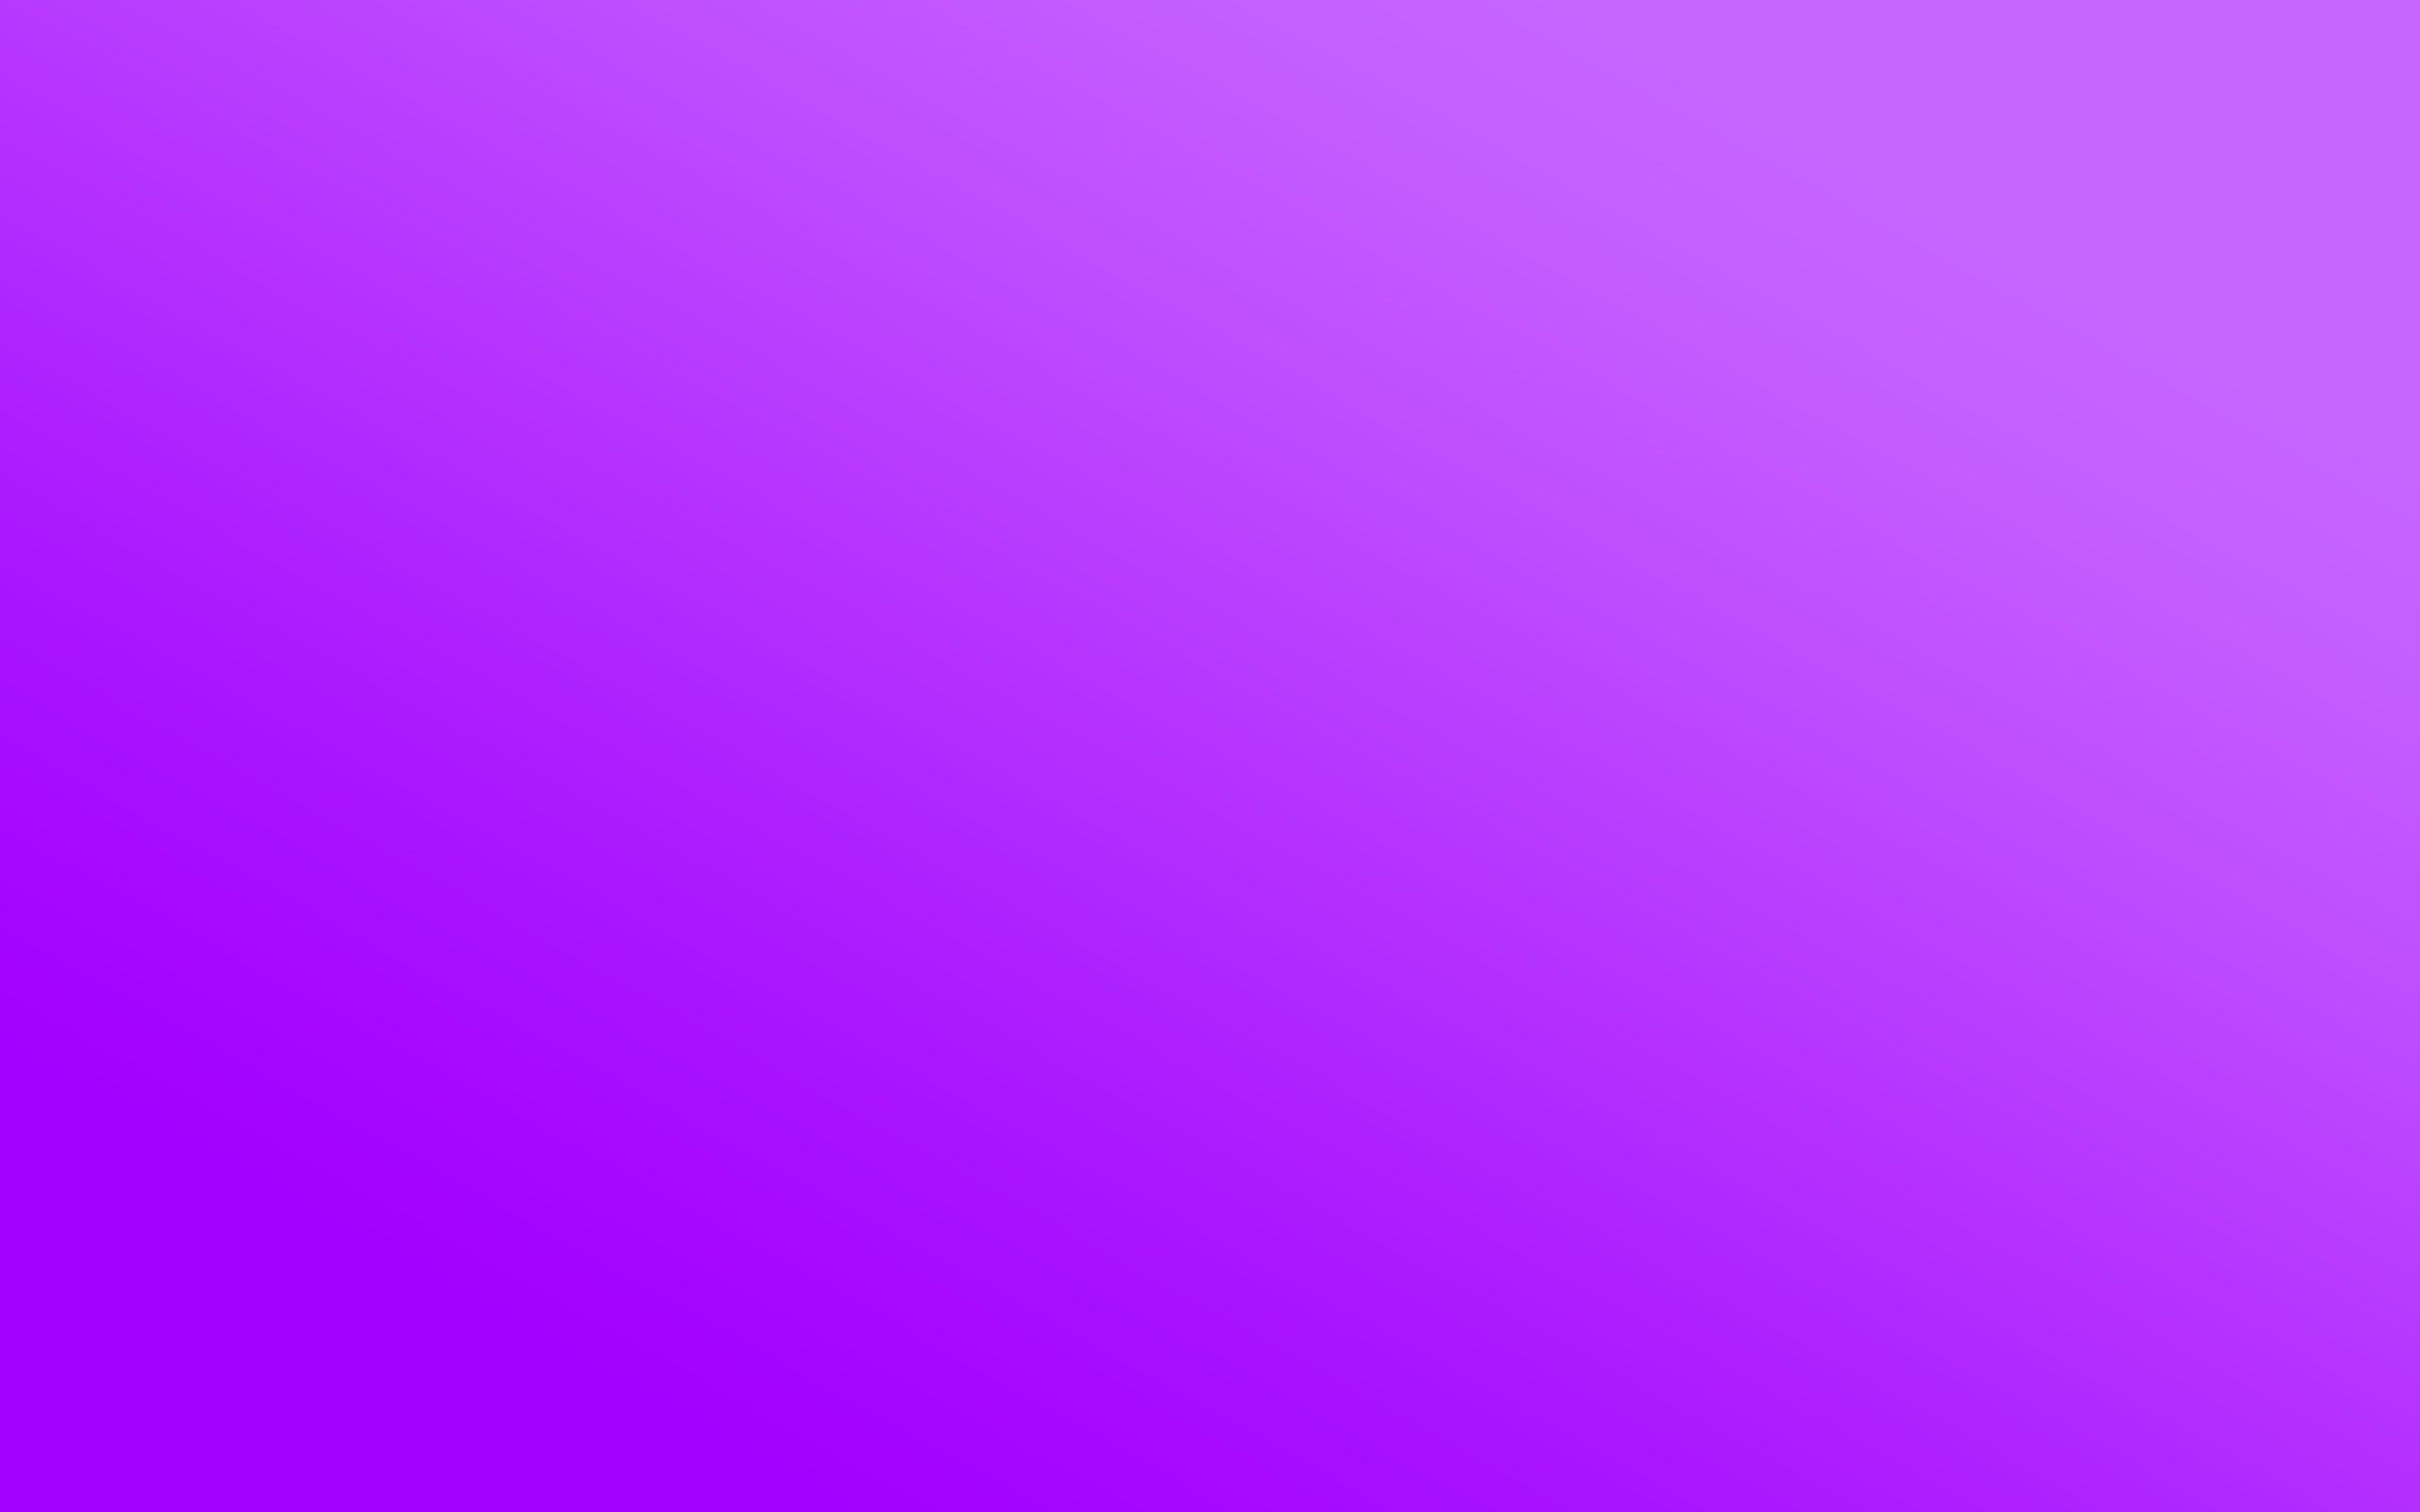 Solid Color Wallpaper 21966